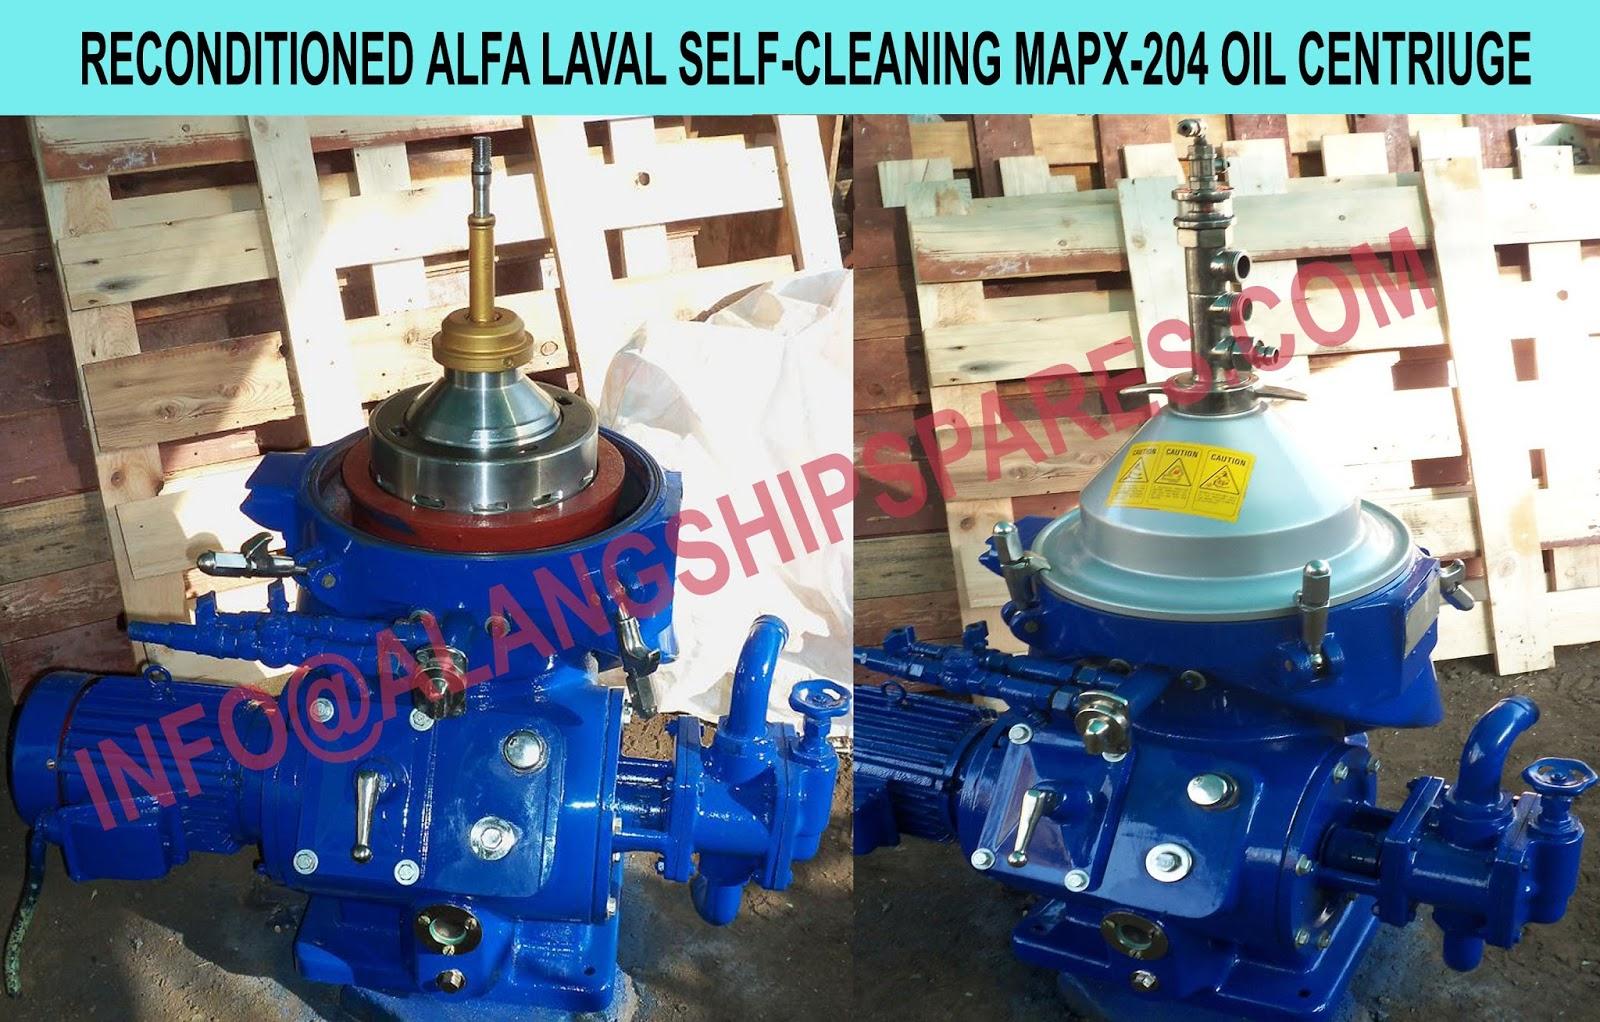 OIL PURIFIER ALFA-LAVAL MOPX 209. OIL PURIFIER ALFA-LAVAL MOPX 210. OIL  PURIFIER ALFA-LAVAL MOPX 309. OIL PURIFIER ALFA-LAVAL MOPX 310